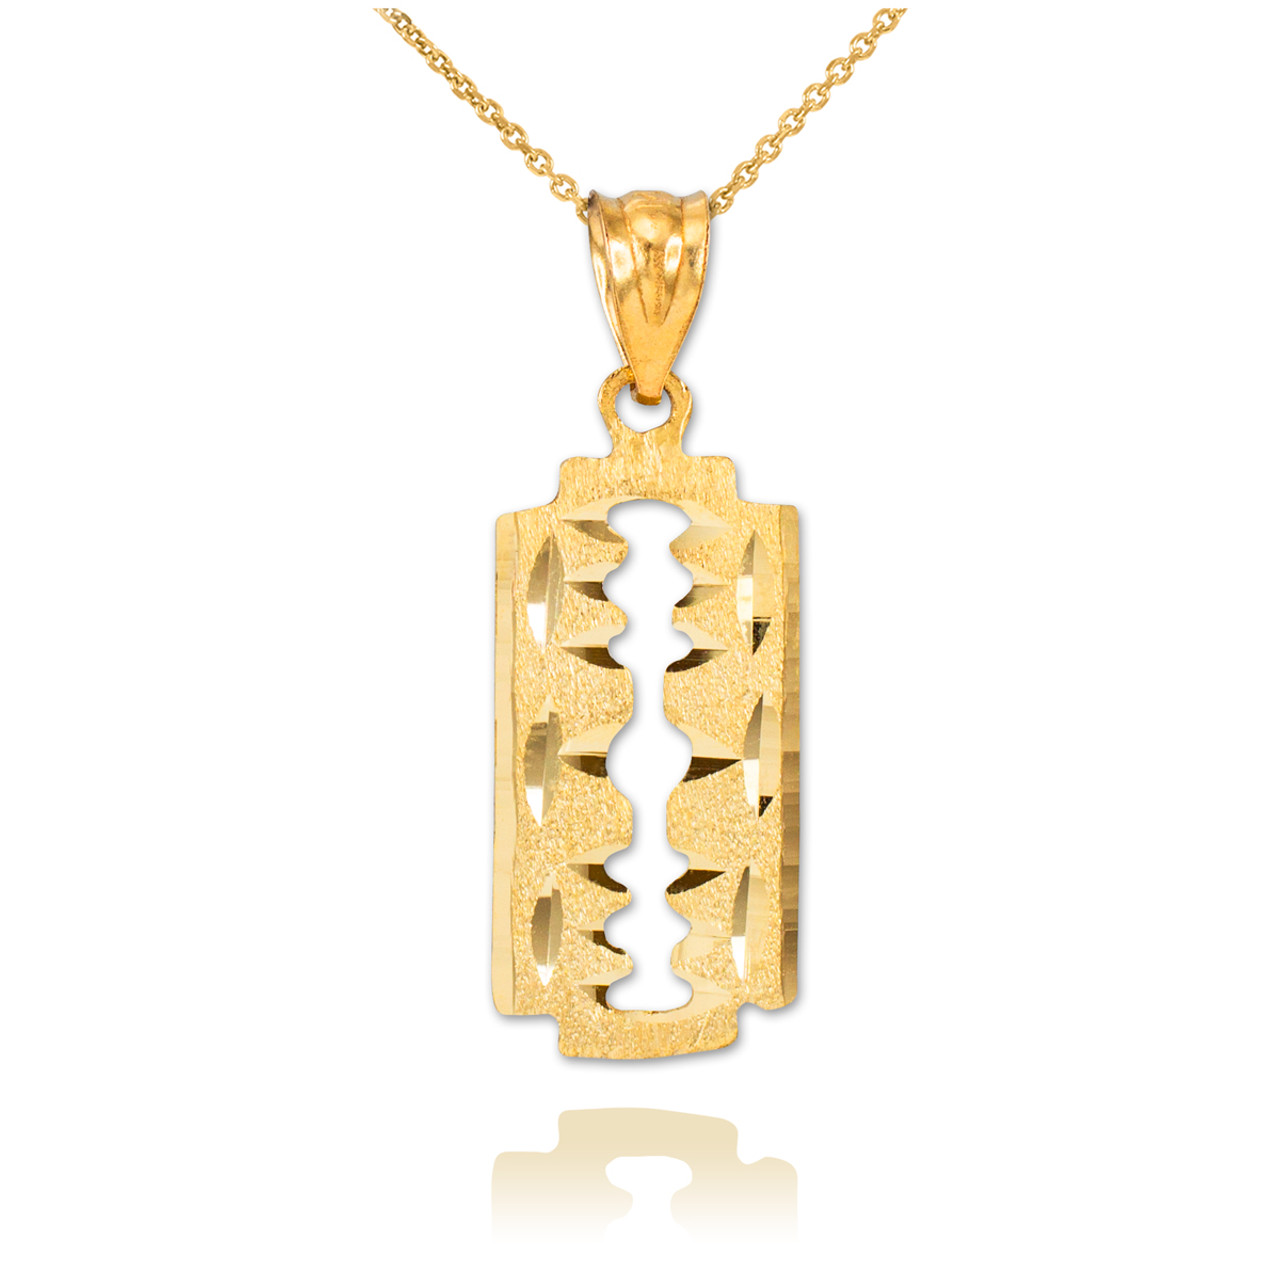 Gold razor blade pendant necklace razor blade gold razor blade pendant necklace altavistaventures Image collections